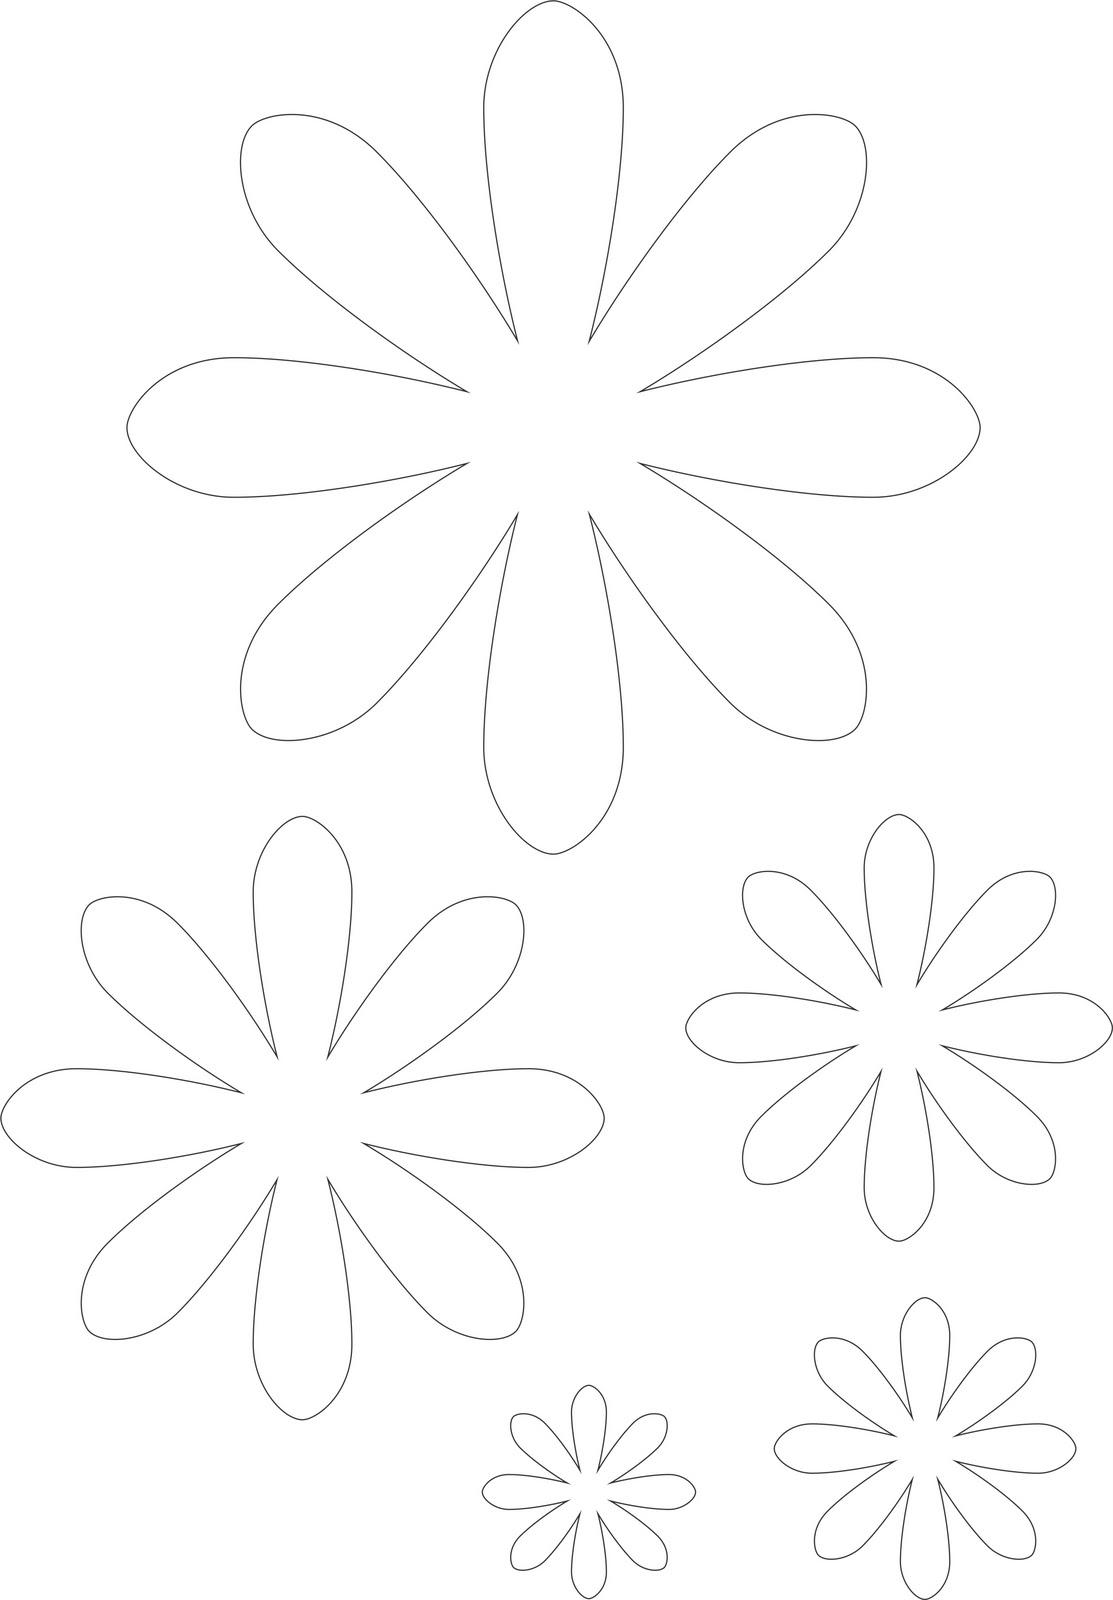 Molde De Flor De Papel. Molde Digital Flor De Papel Modelo Fine ...